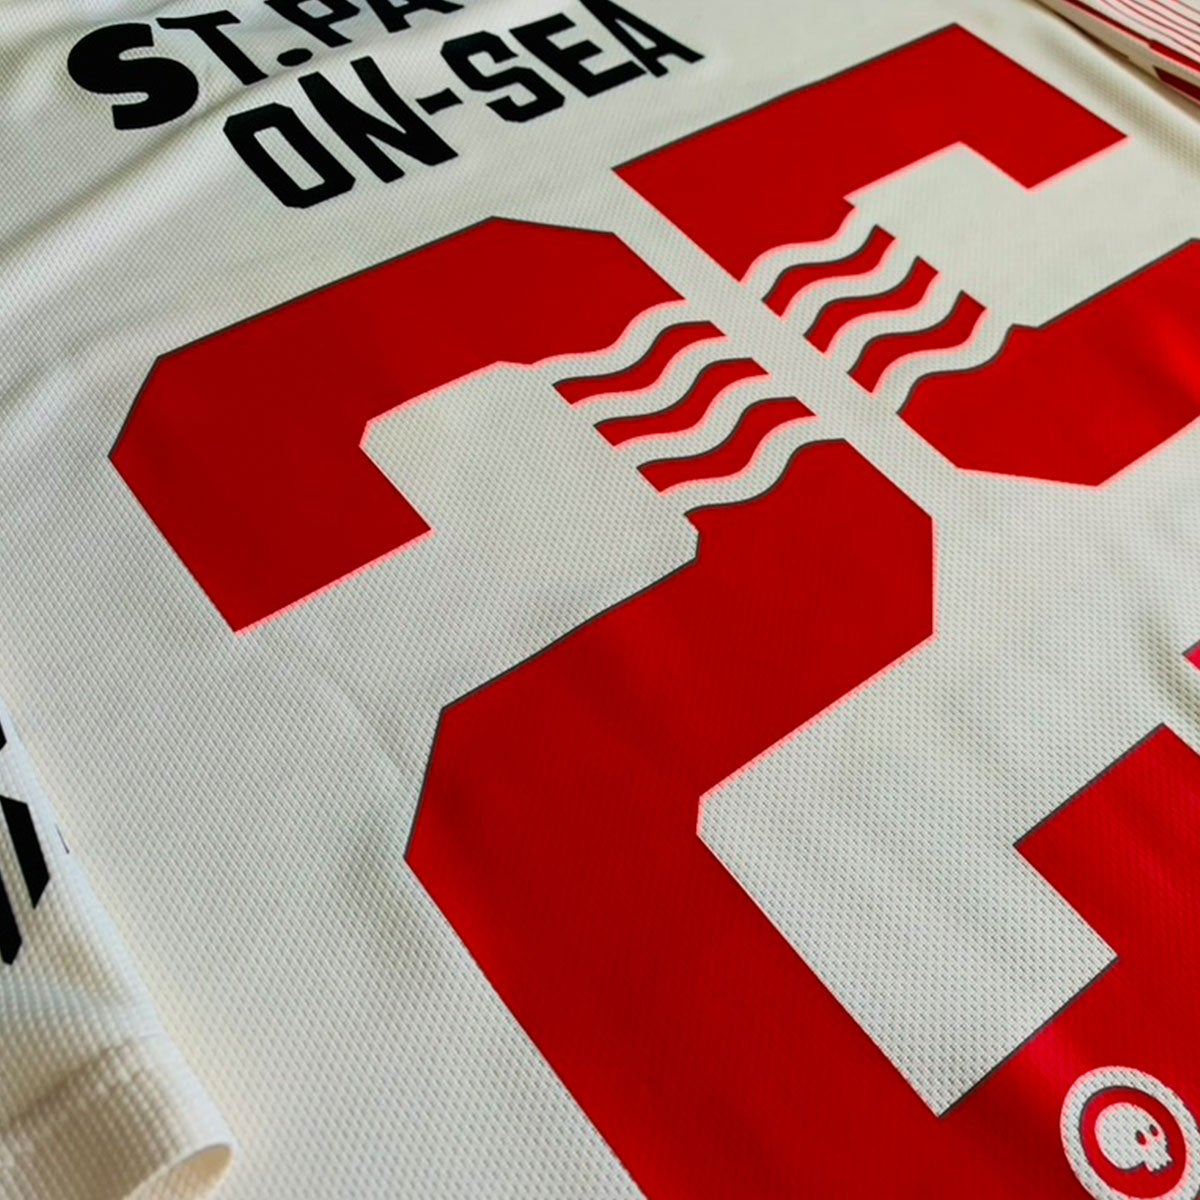 Image of St Pauli On-Sea Shirt Printing